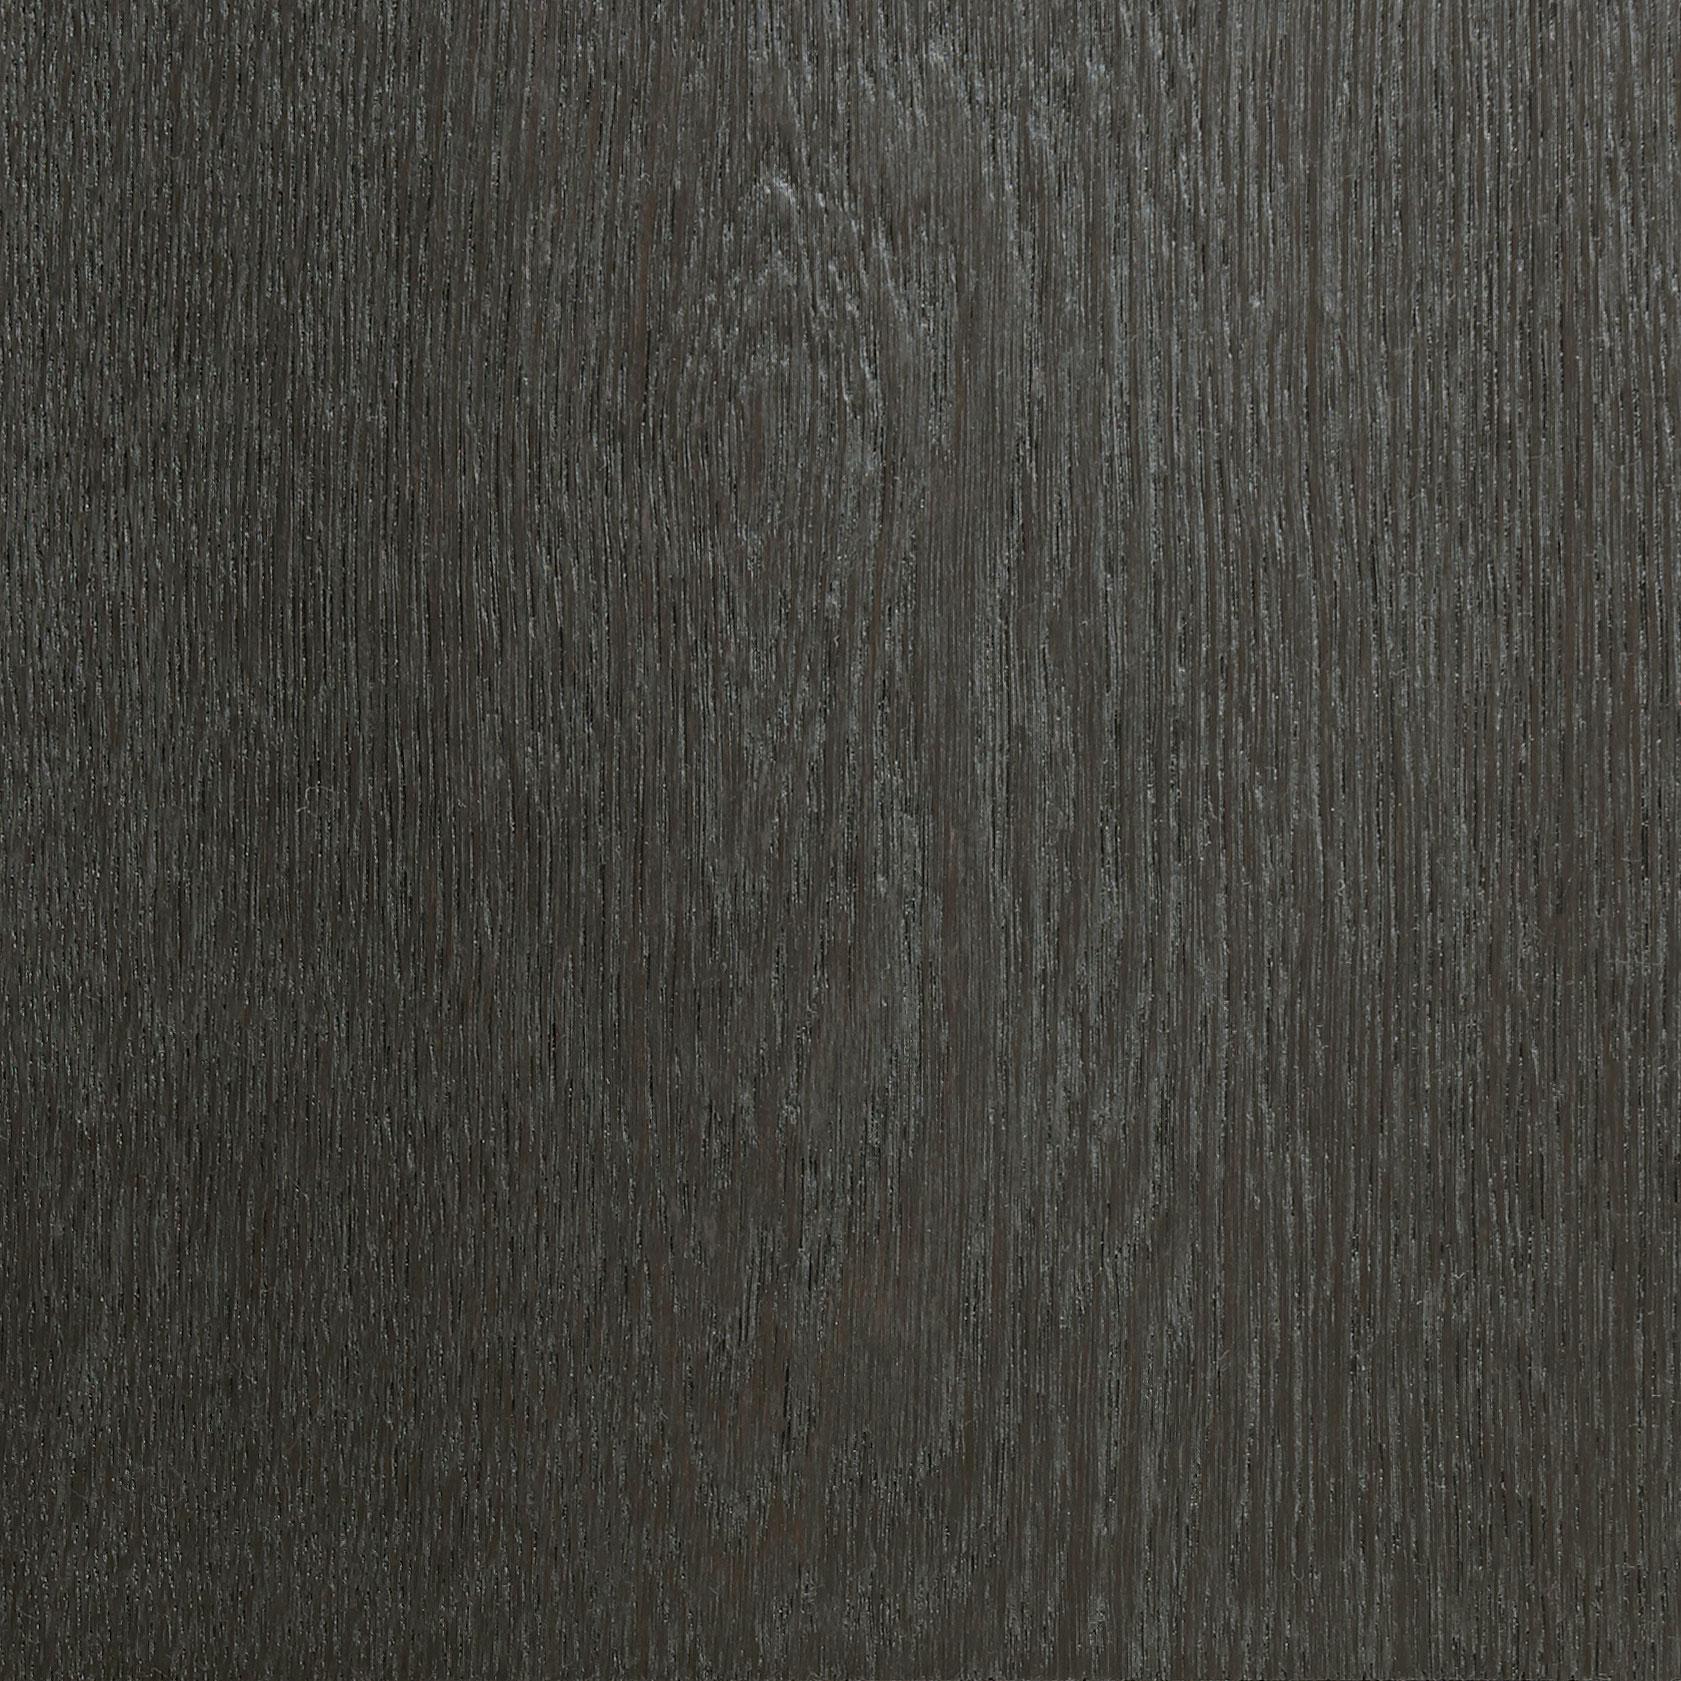 Element7-wide-plank-samples-GothamOak_AJ_562_019-copy_